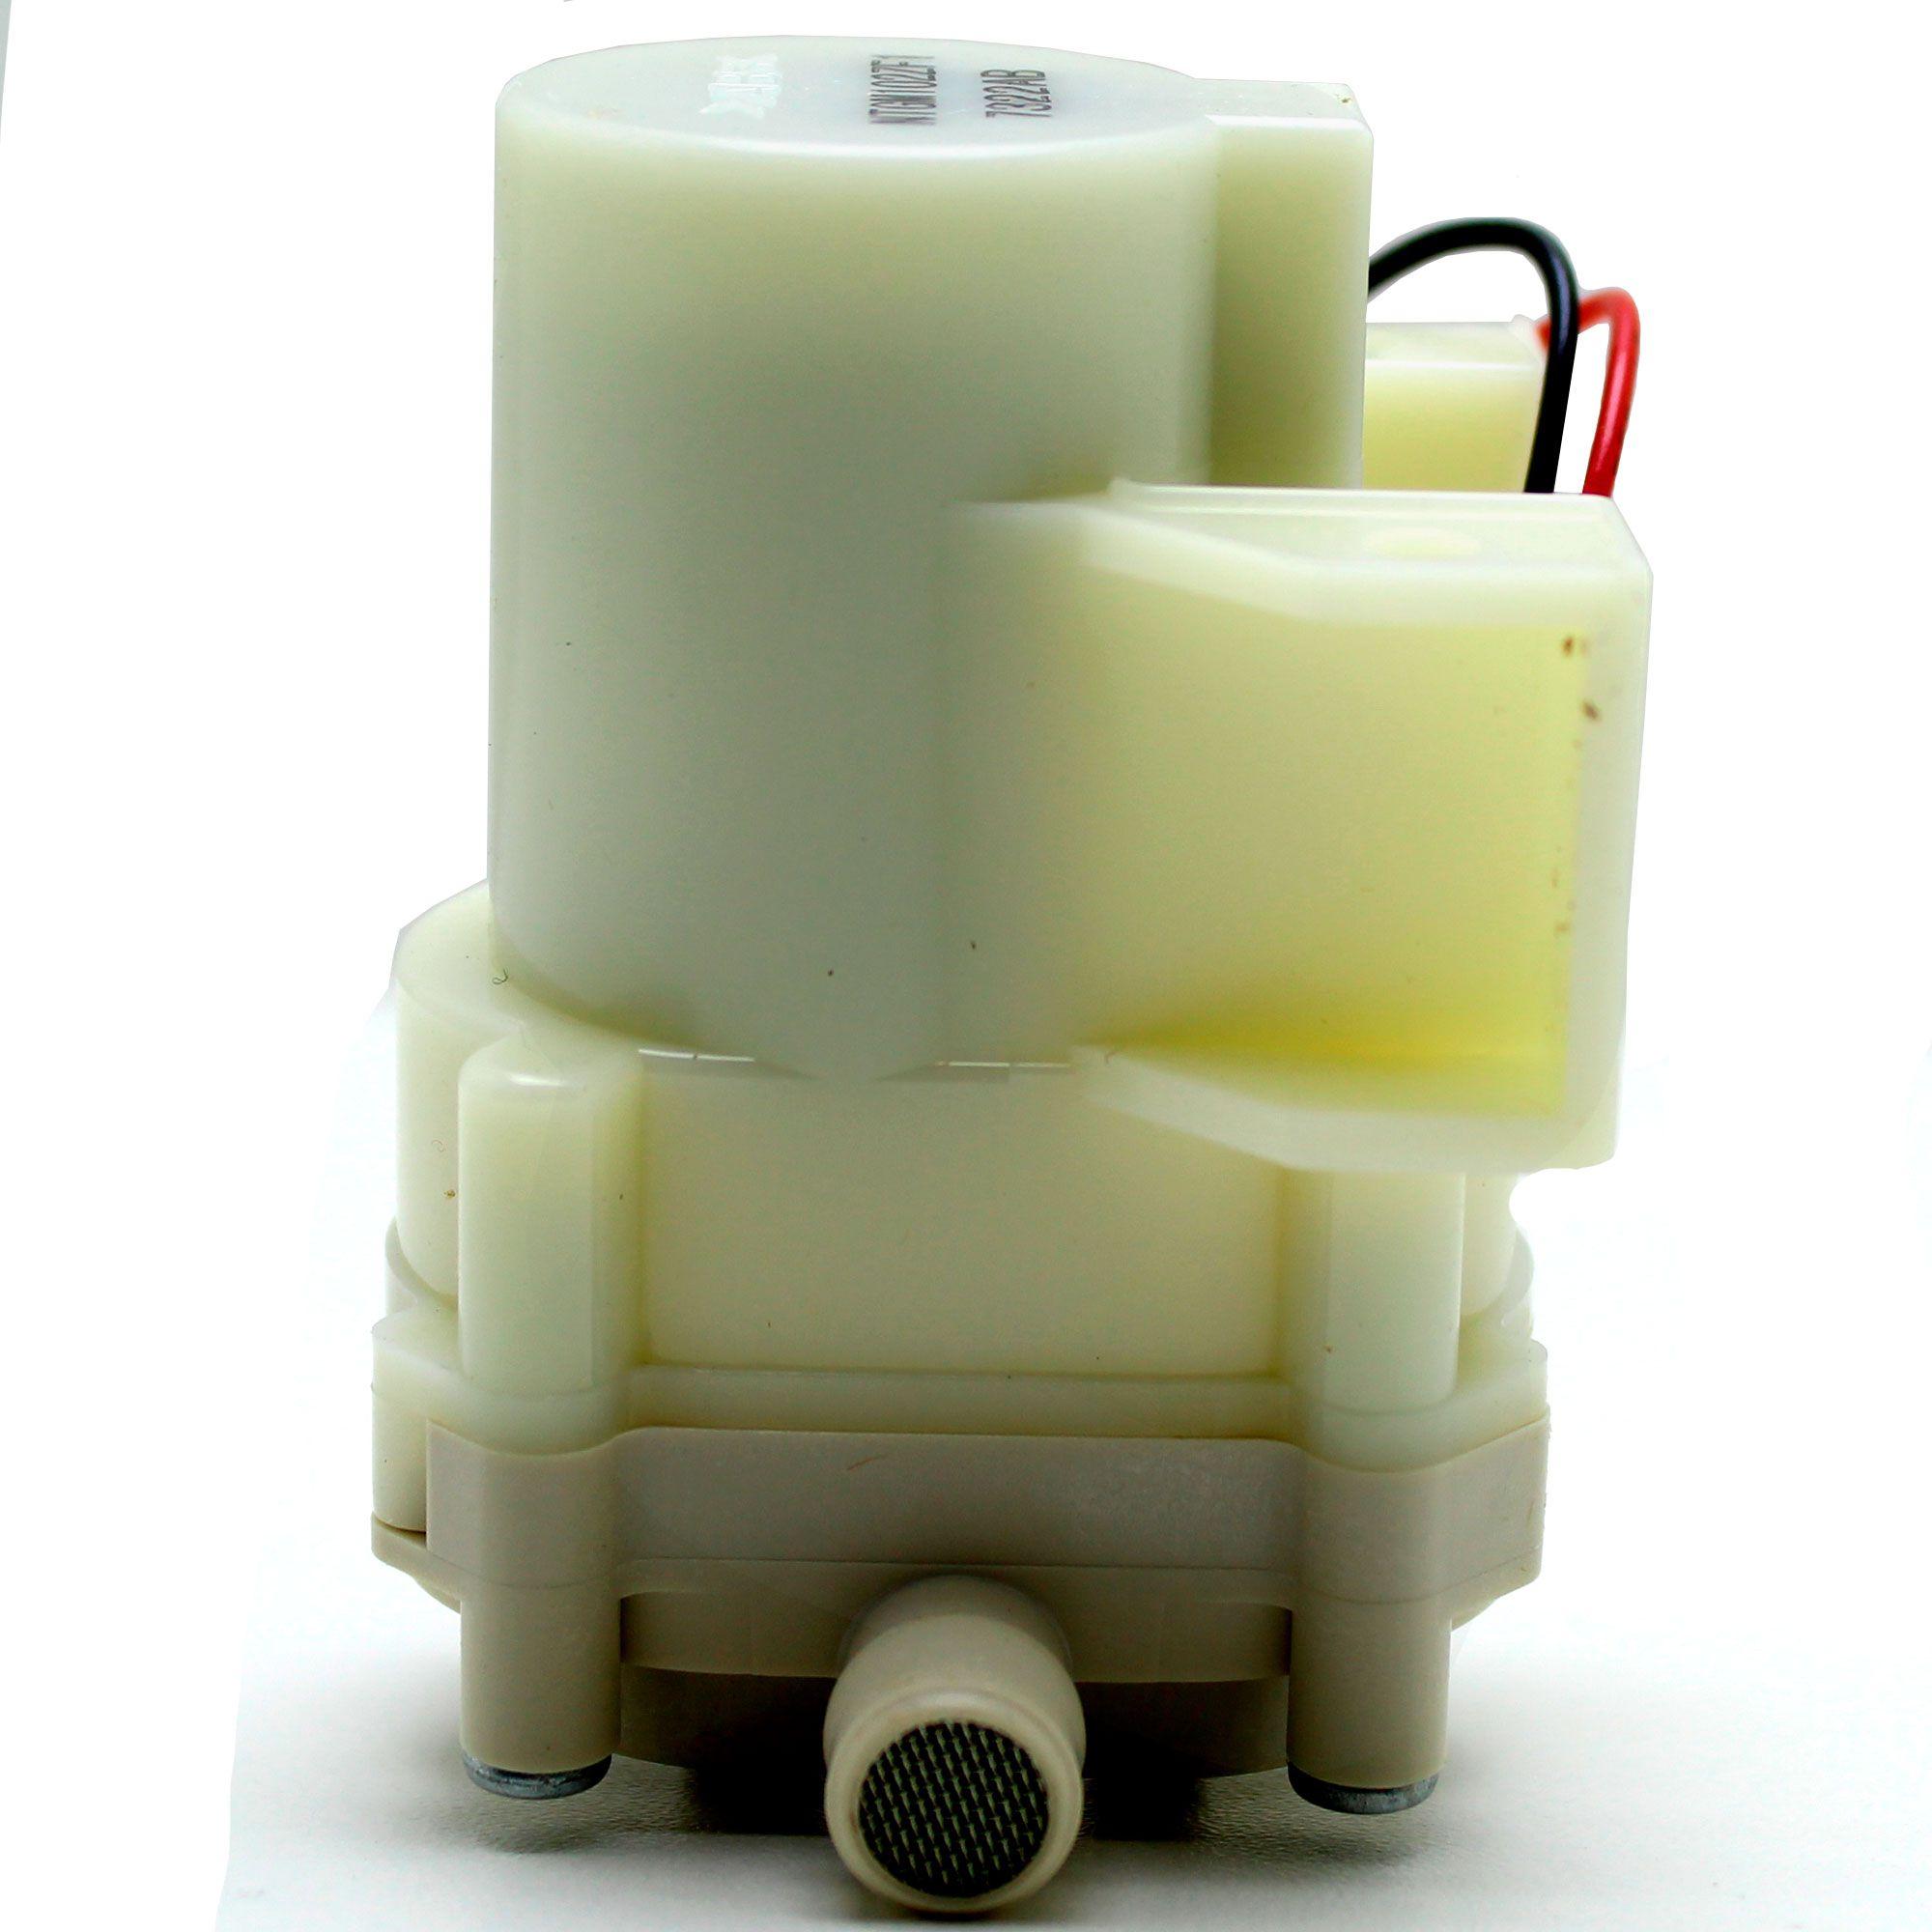 Bomba Água Refrigerador Electrolux 64287513